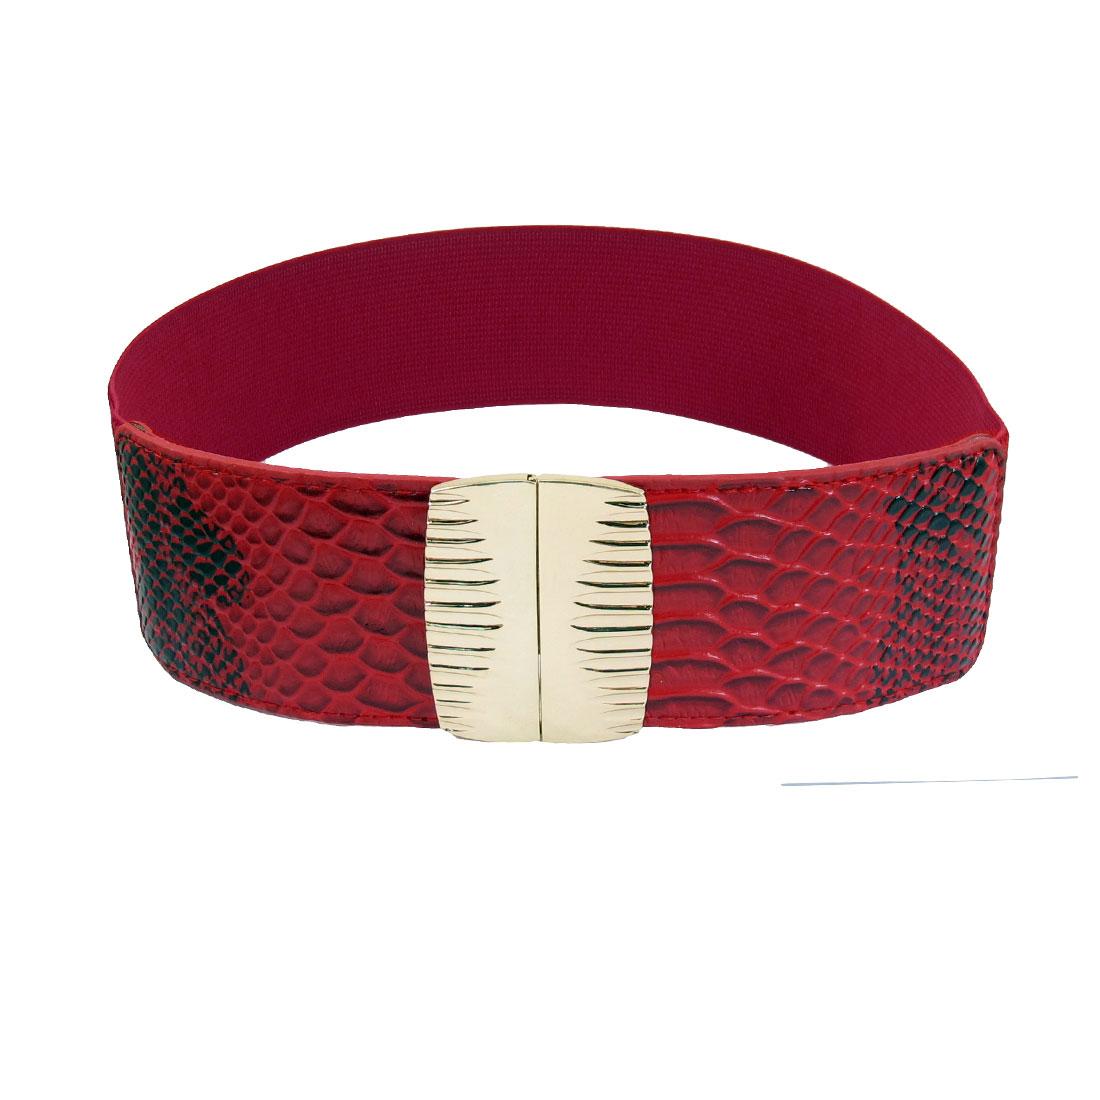 "Red Faux Leather Snake Pattern Elastic Band 2.6"" Width Interlocking Women Waist Belt"